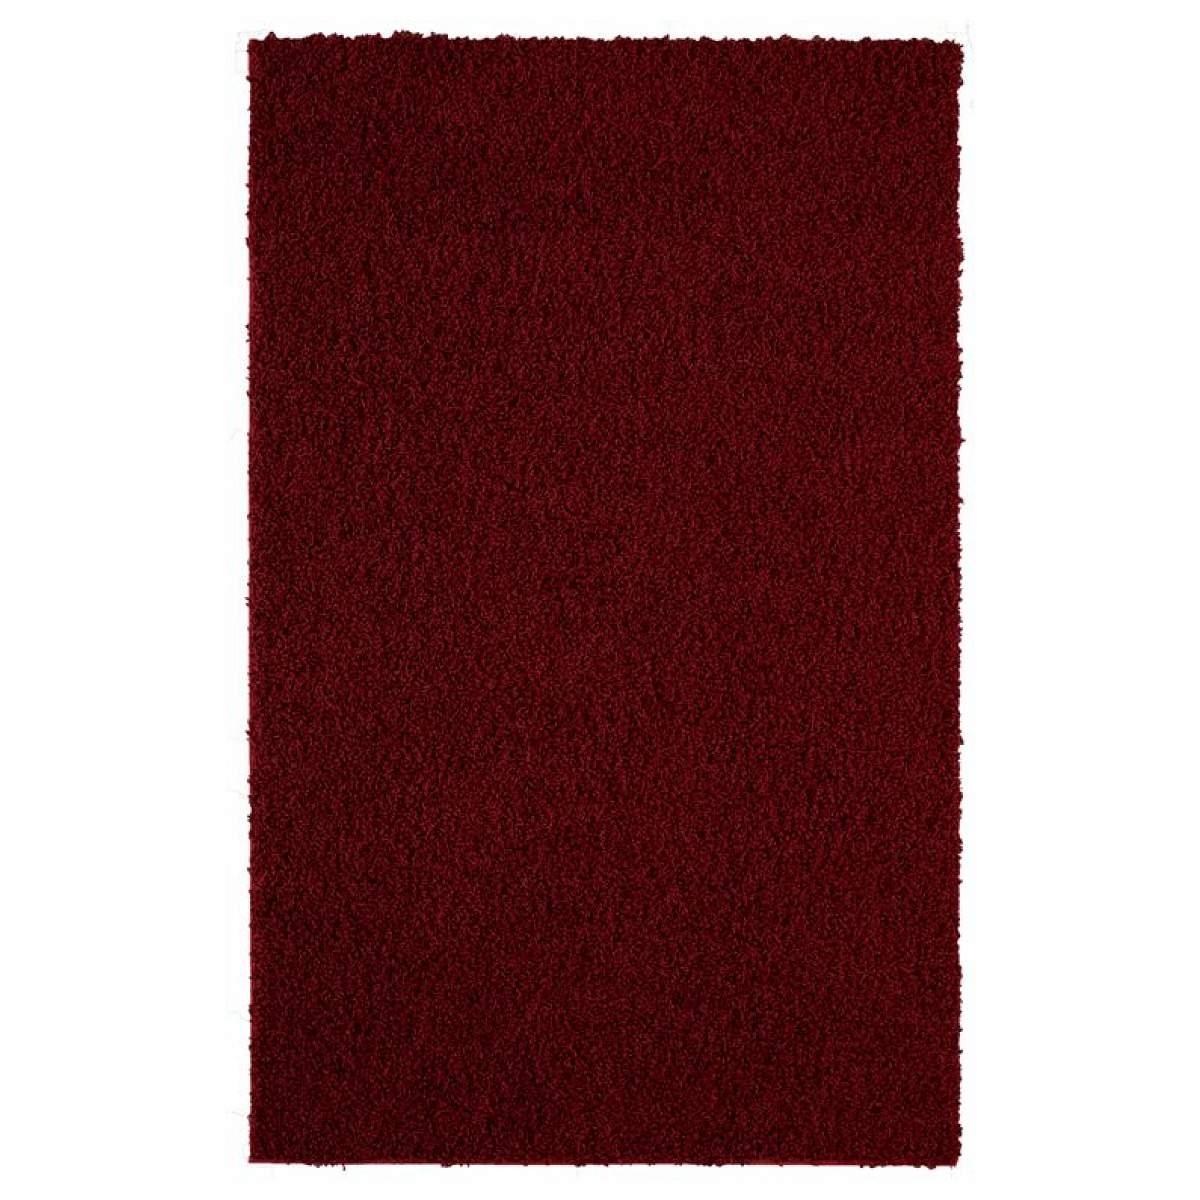 Outdoor Carpet Custom Size Carpet Vidalondon With Custom Size Outdoor Rugs (Image 11 of 15)